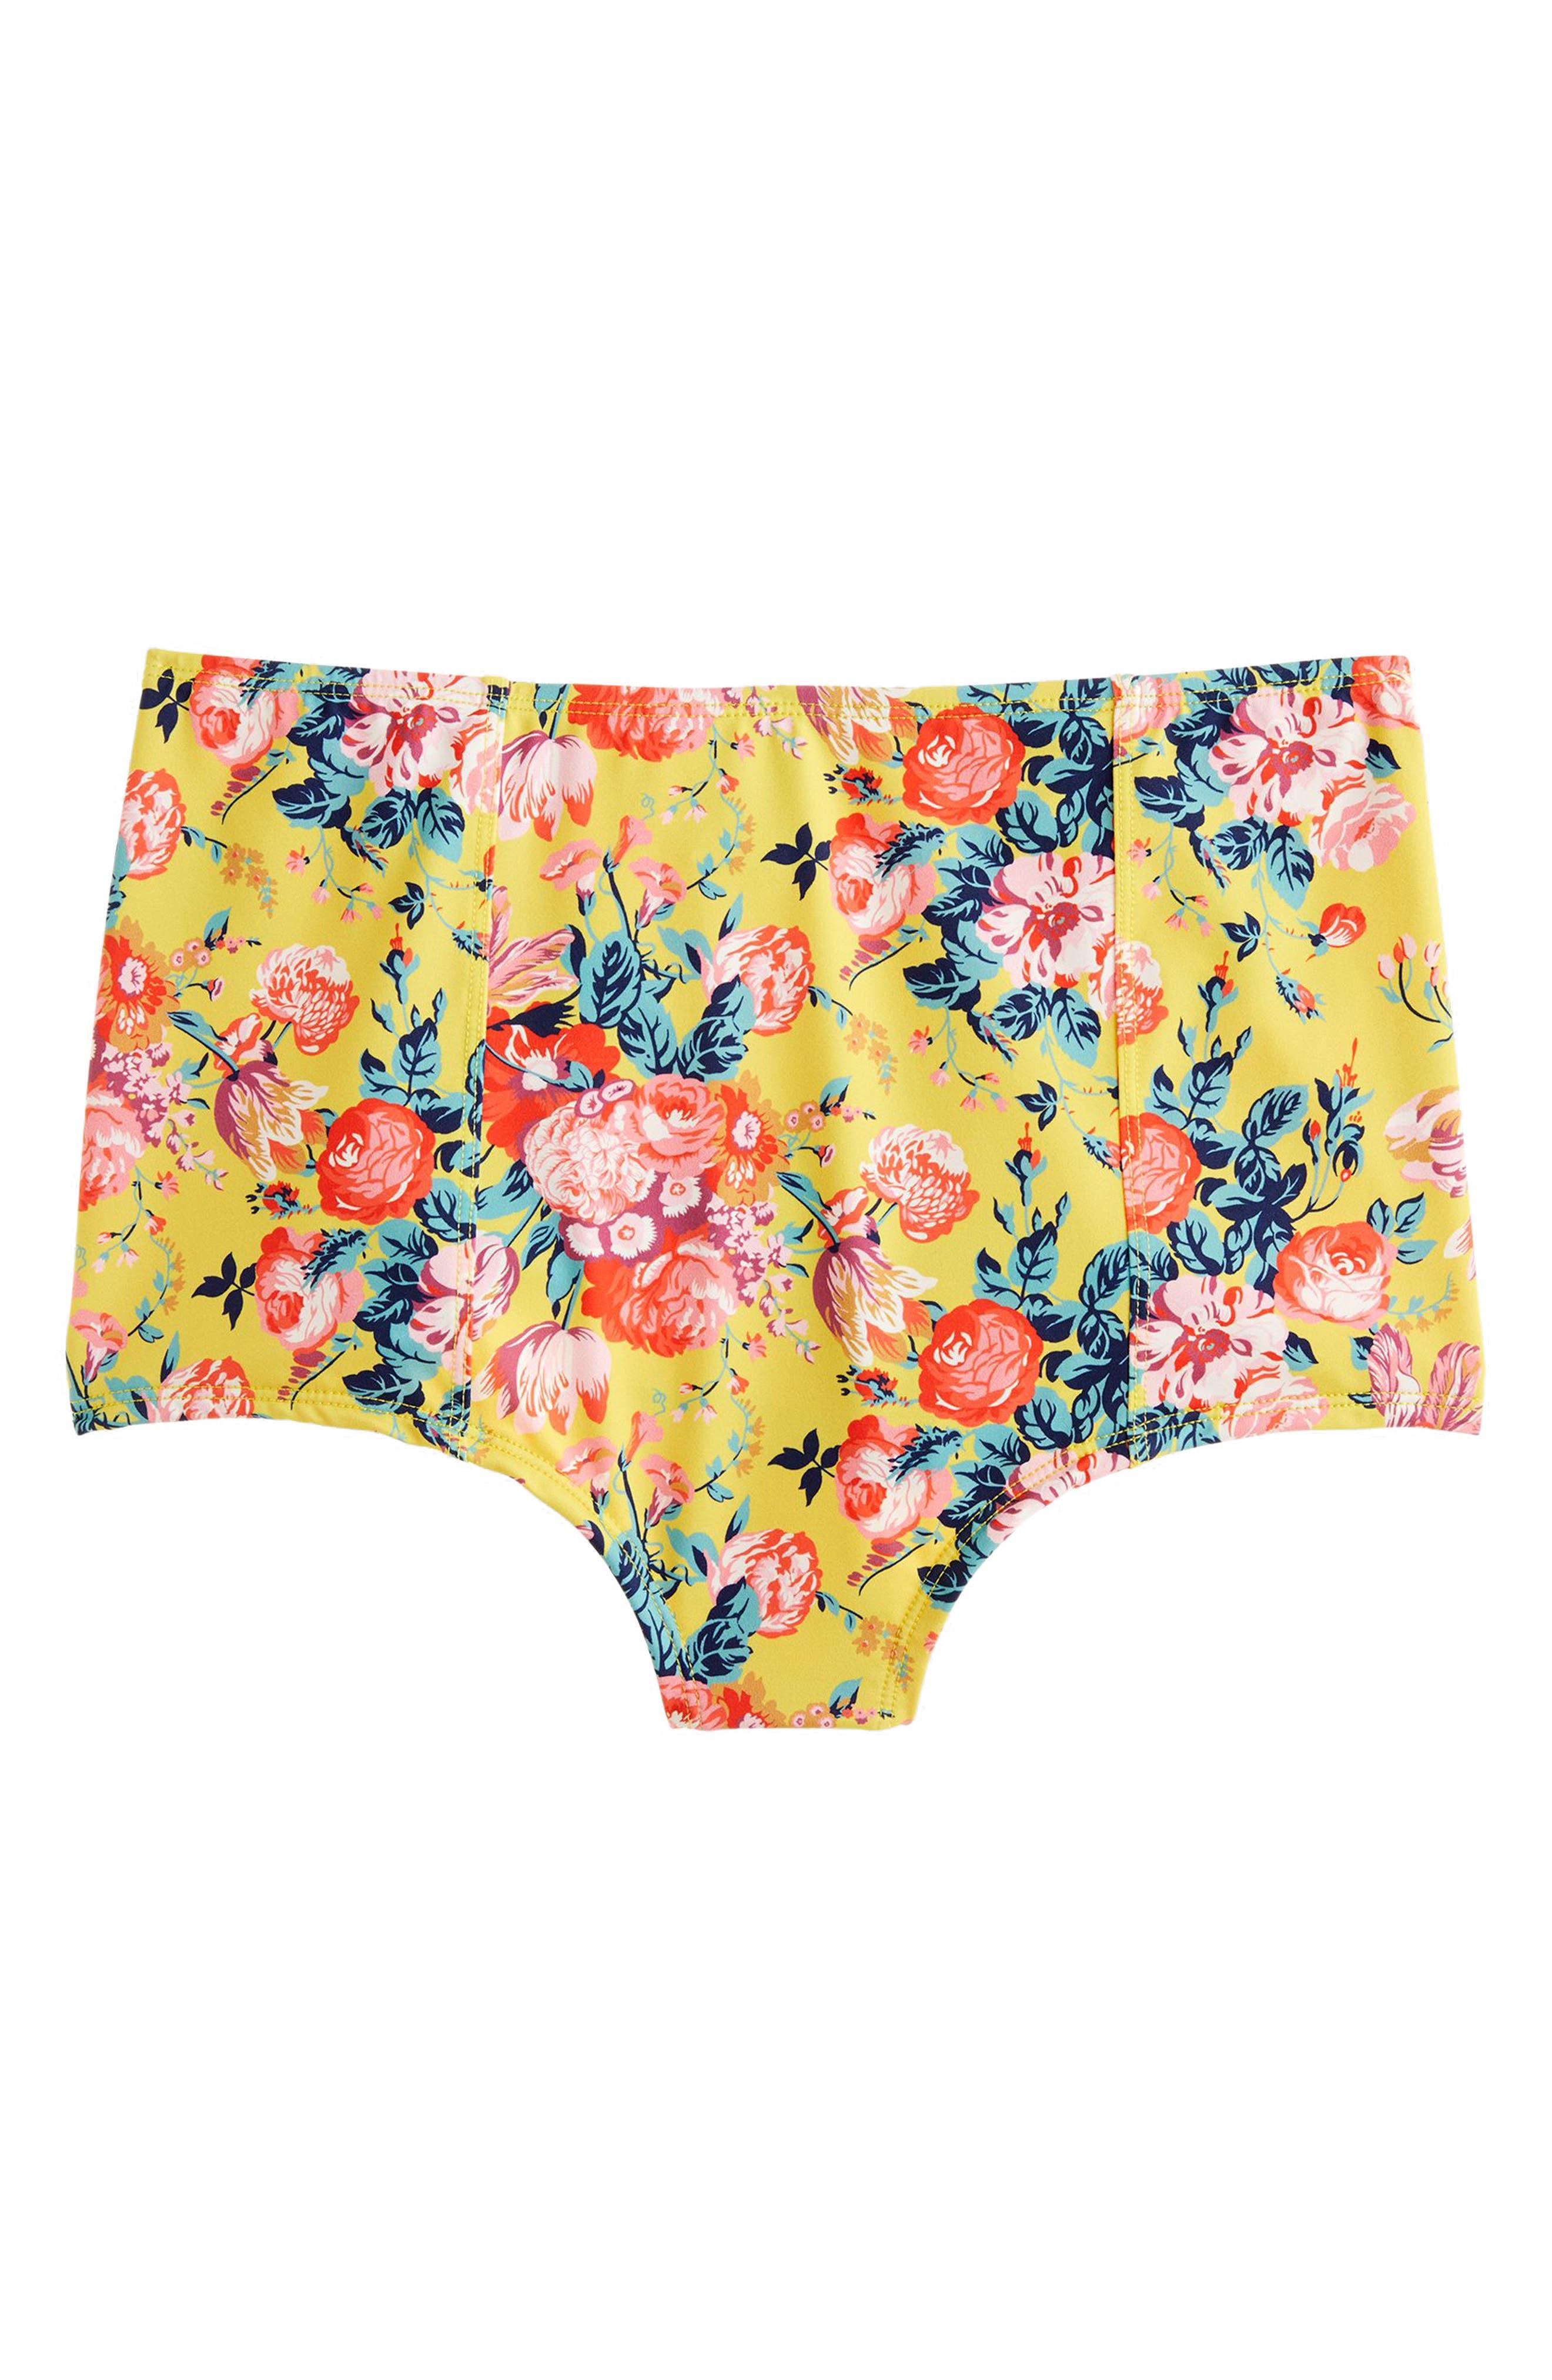 Liberty Magical Bouquet High Waist Bikini Bottom,                         Main,                         color, YELLOW FLORAL